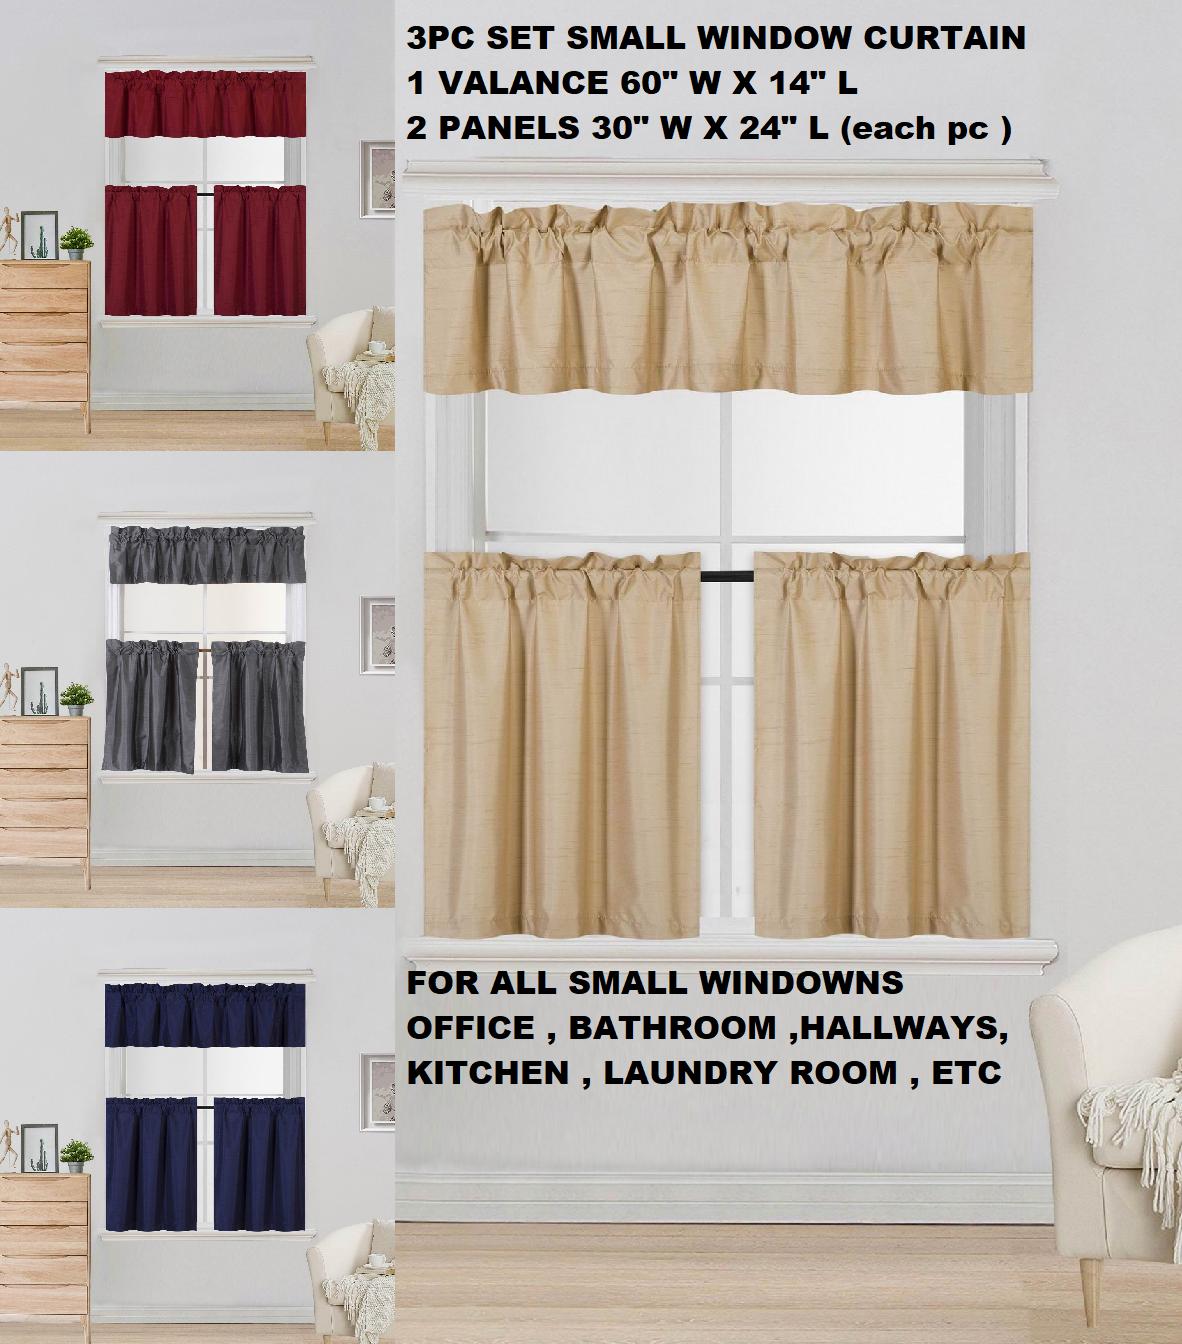 New Modern 3PC Kitchen Blackout Window Valance Tier Curtain Panel Set 54